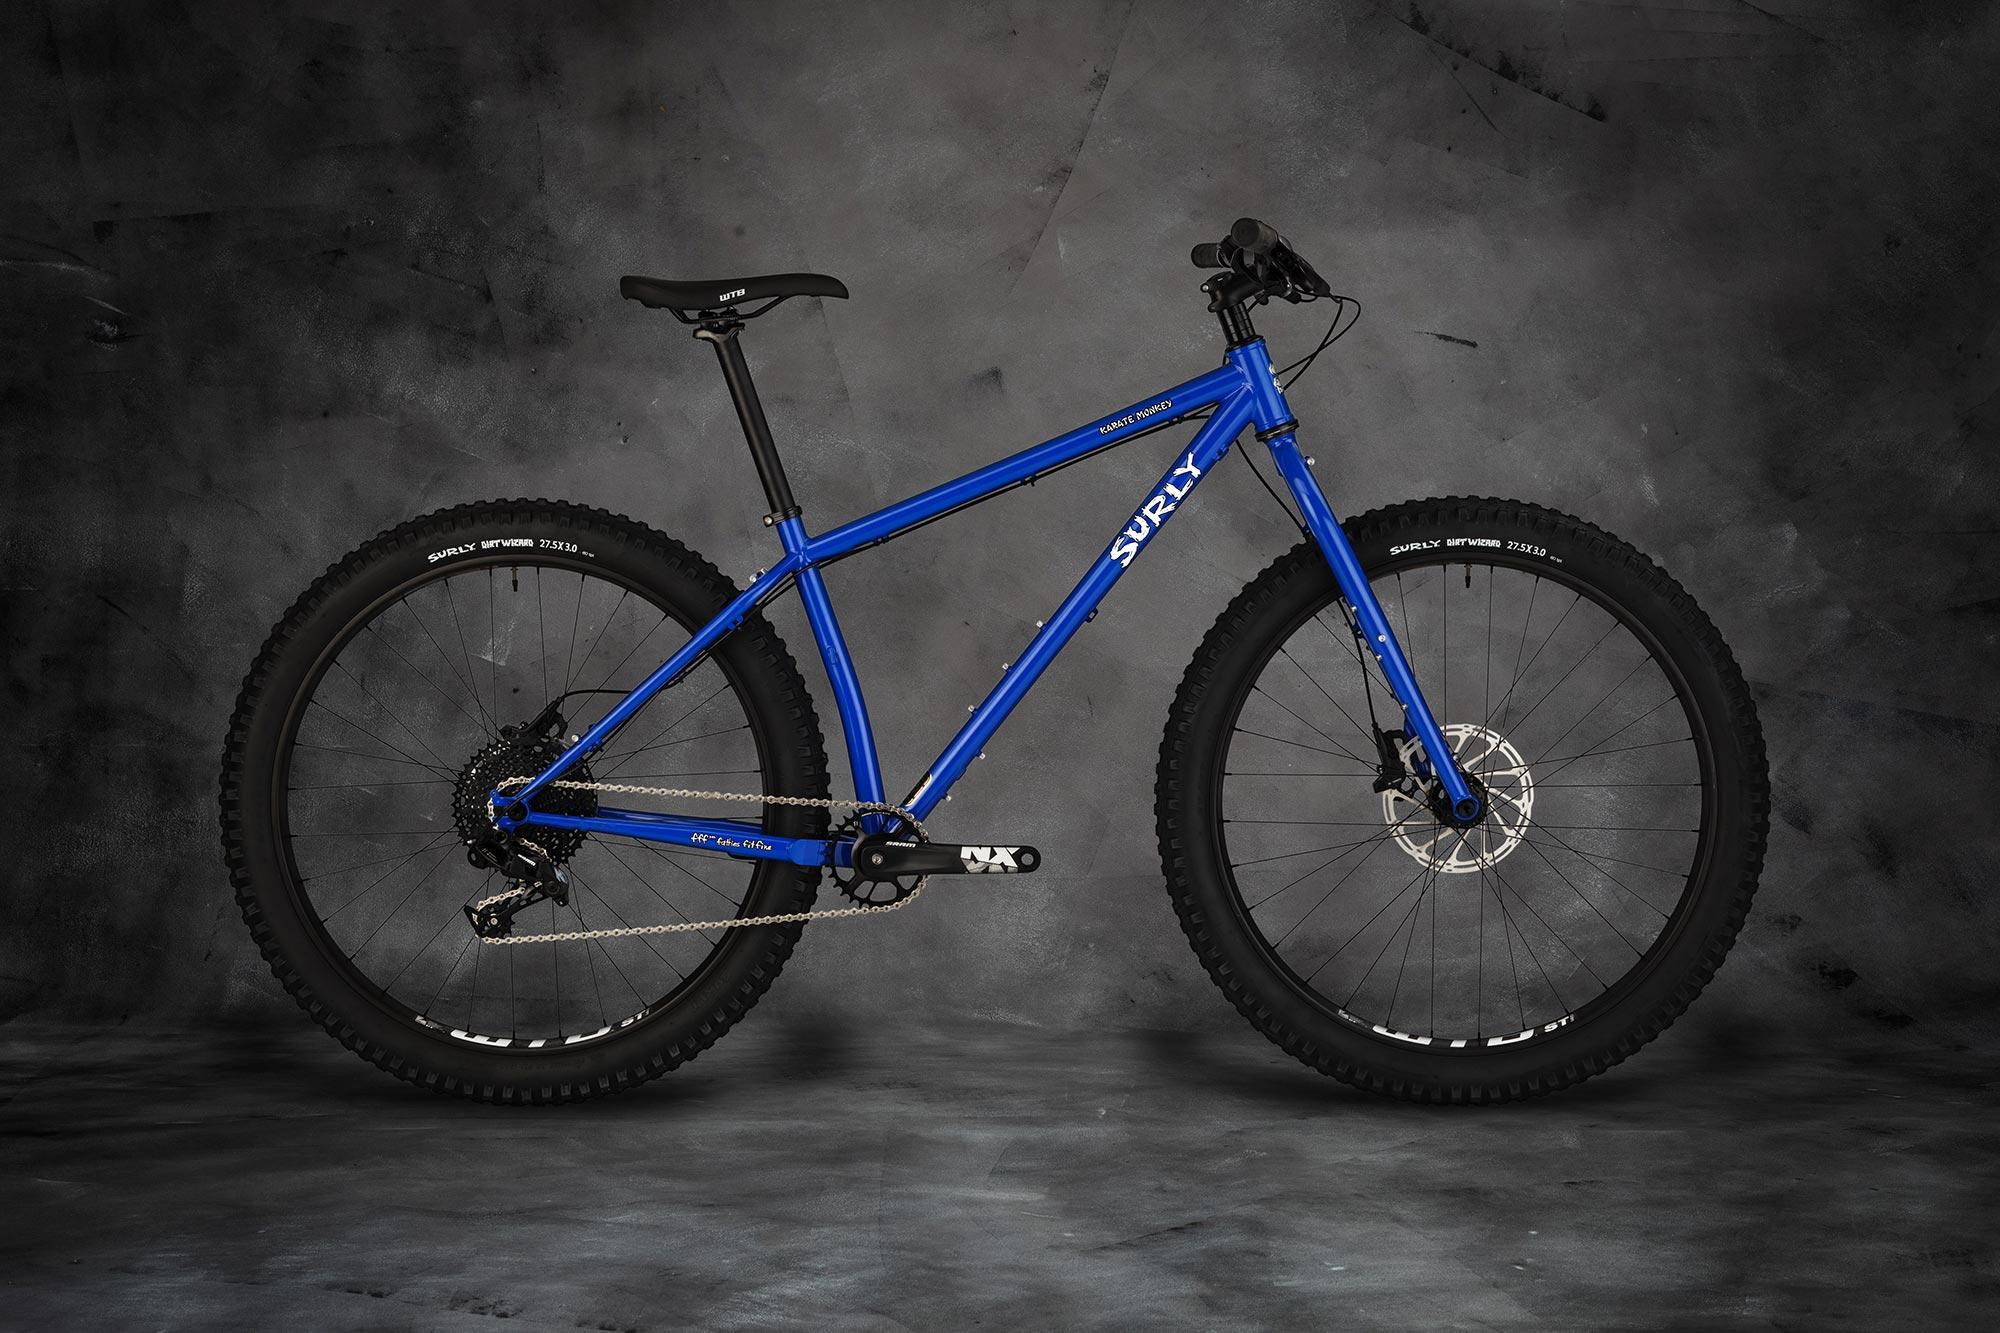 Surly Karate Monkey Bike - Blue Porta Potty - right side view